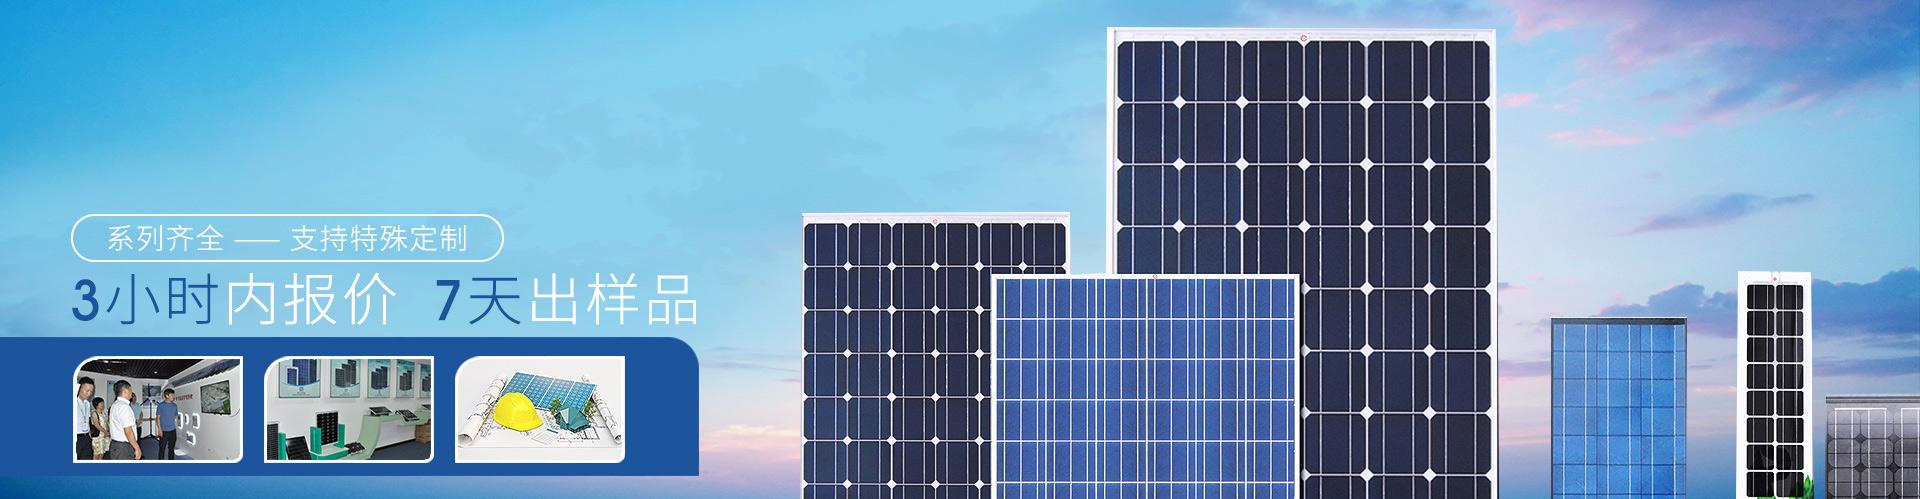 星火(huo)太陽能太陽能應用產(chan)品